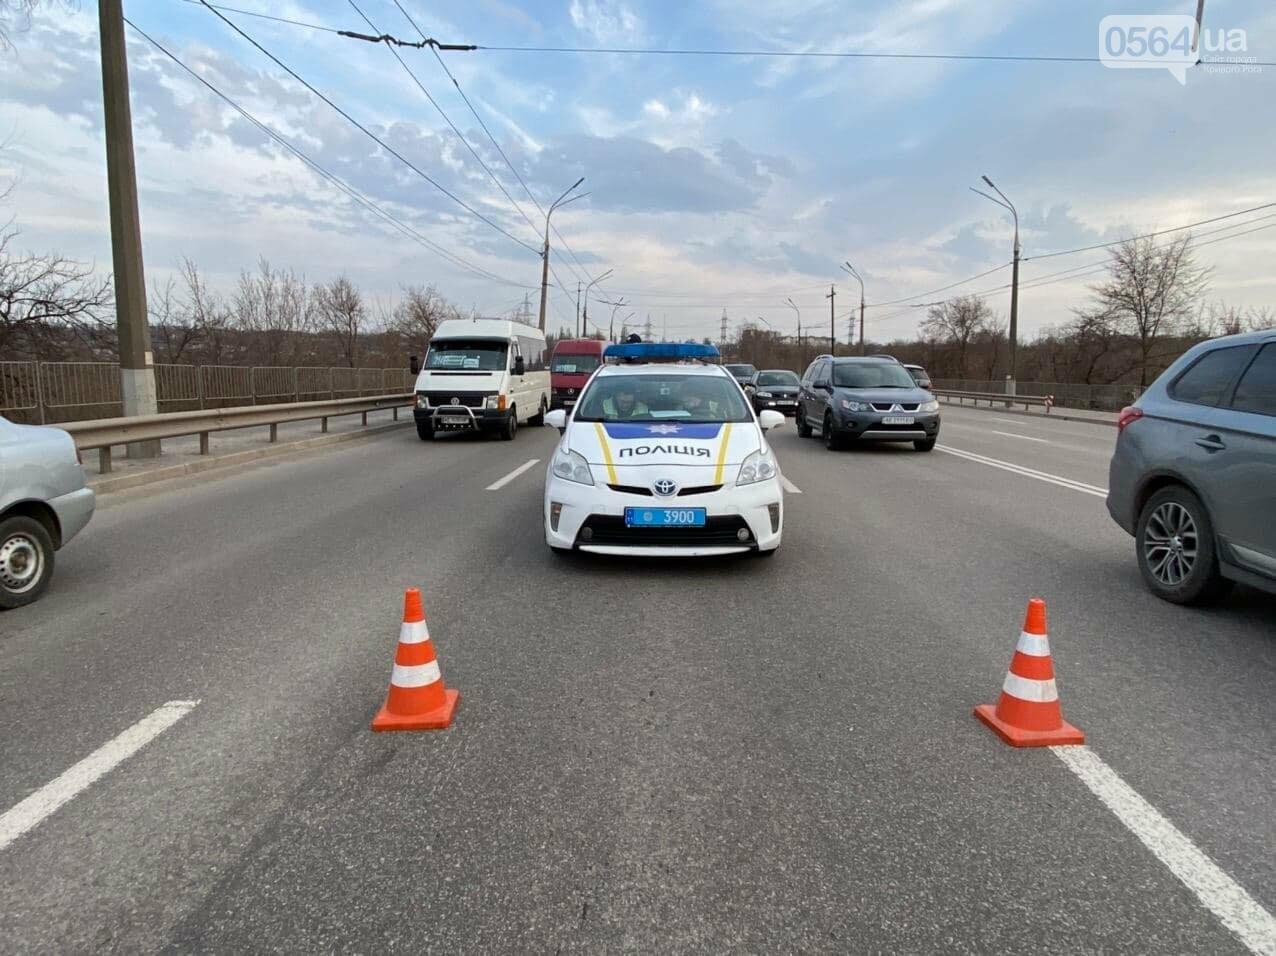 5 машин разбились в ДТП в Кривом Роге, - ФОТО, фото-10